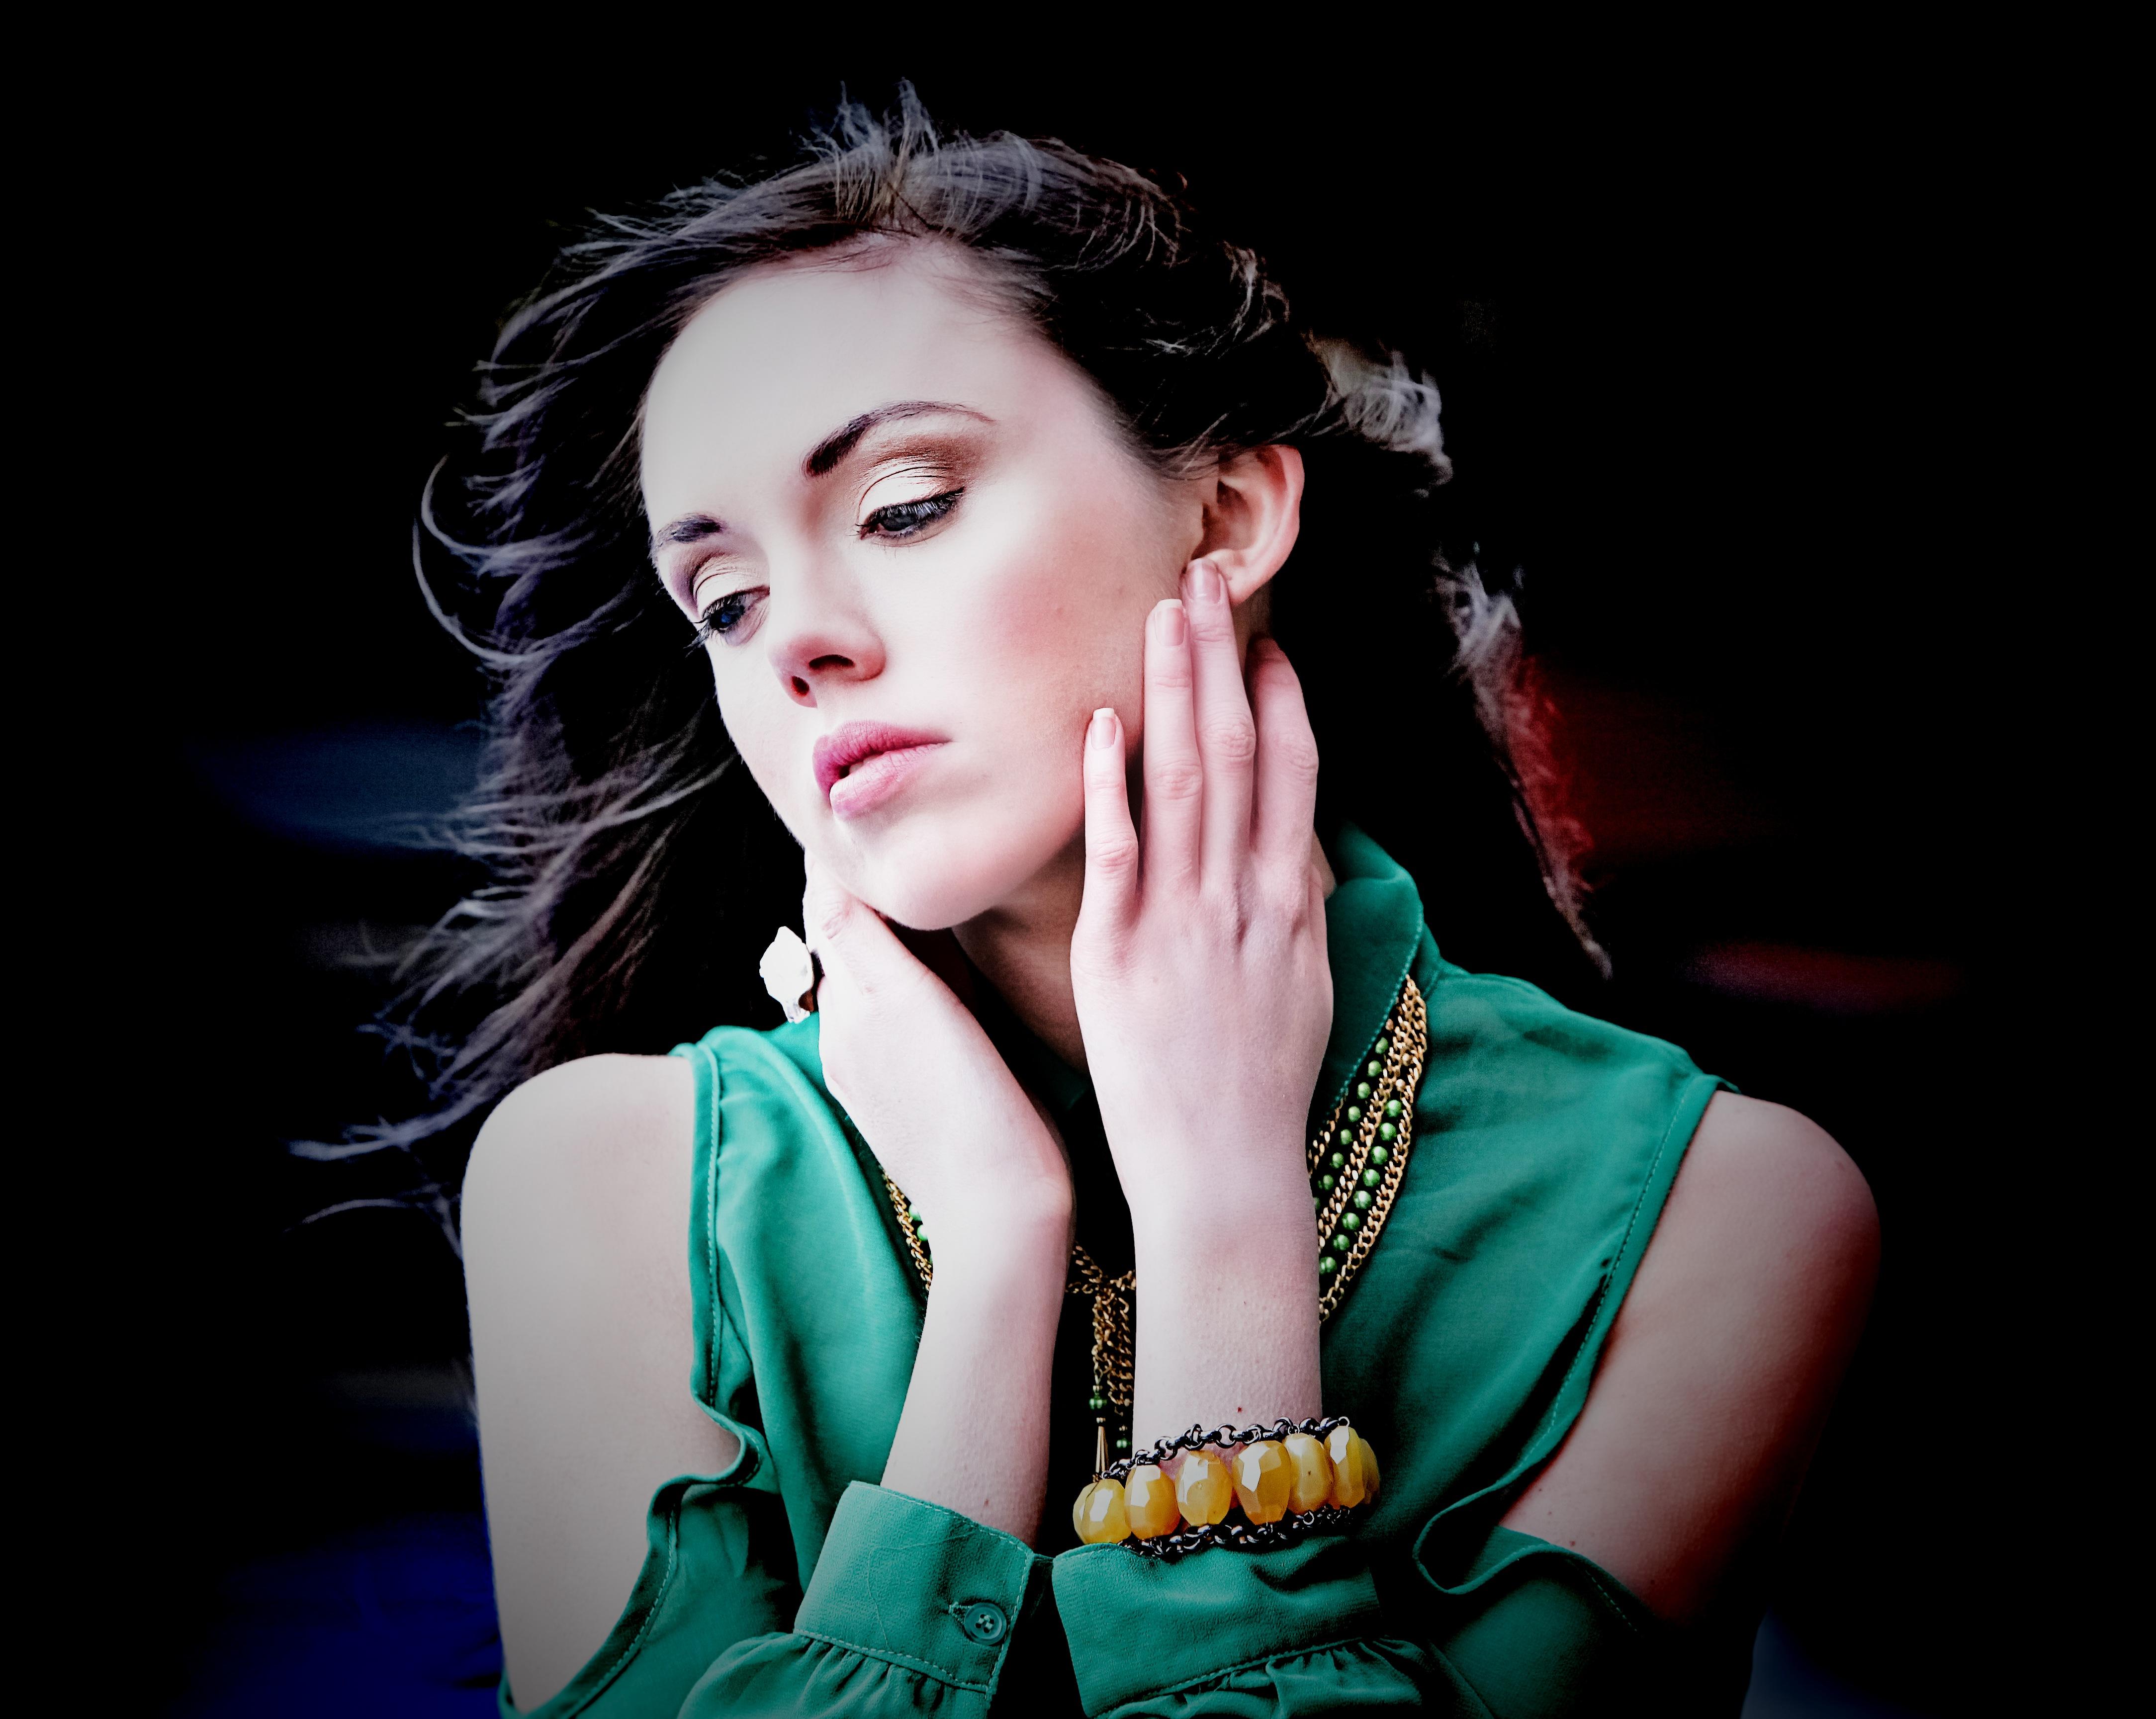 Wicked Peacock featuring Magdalena Stokalska